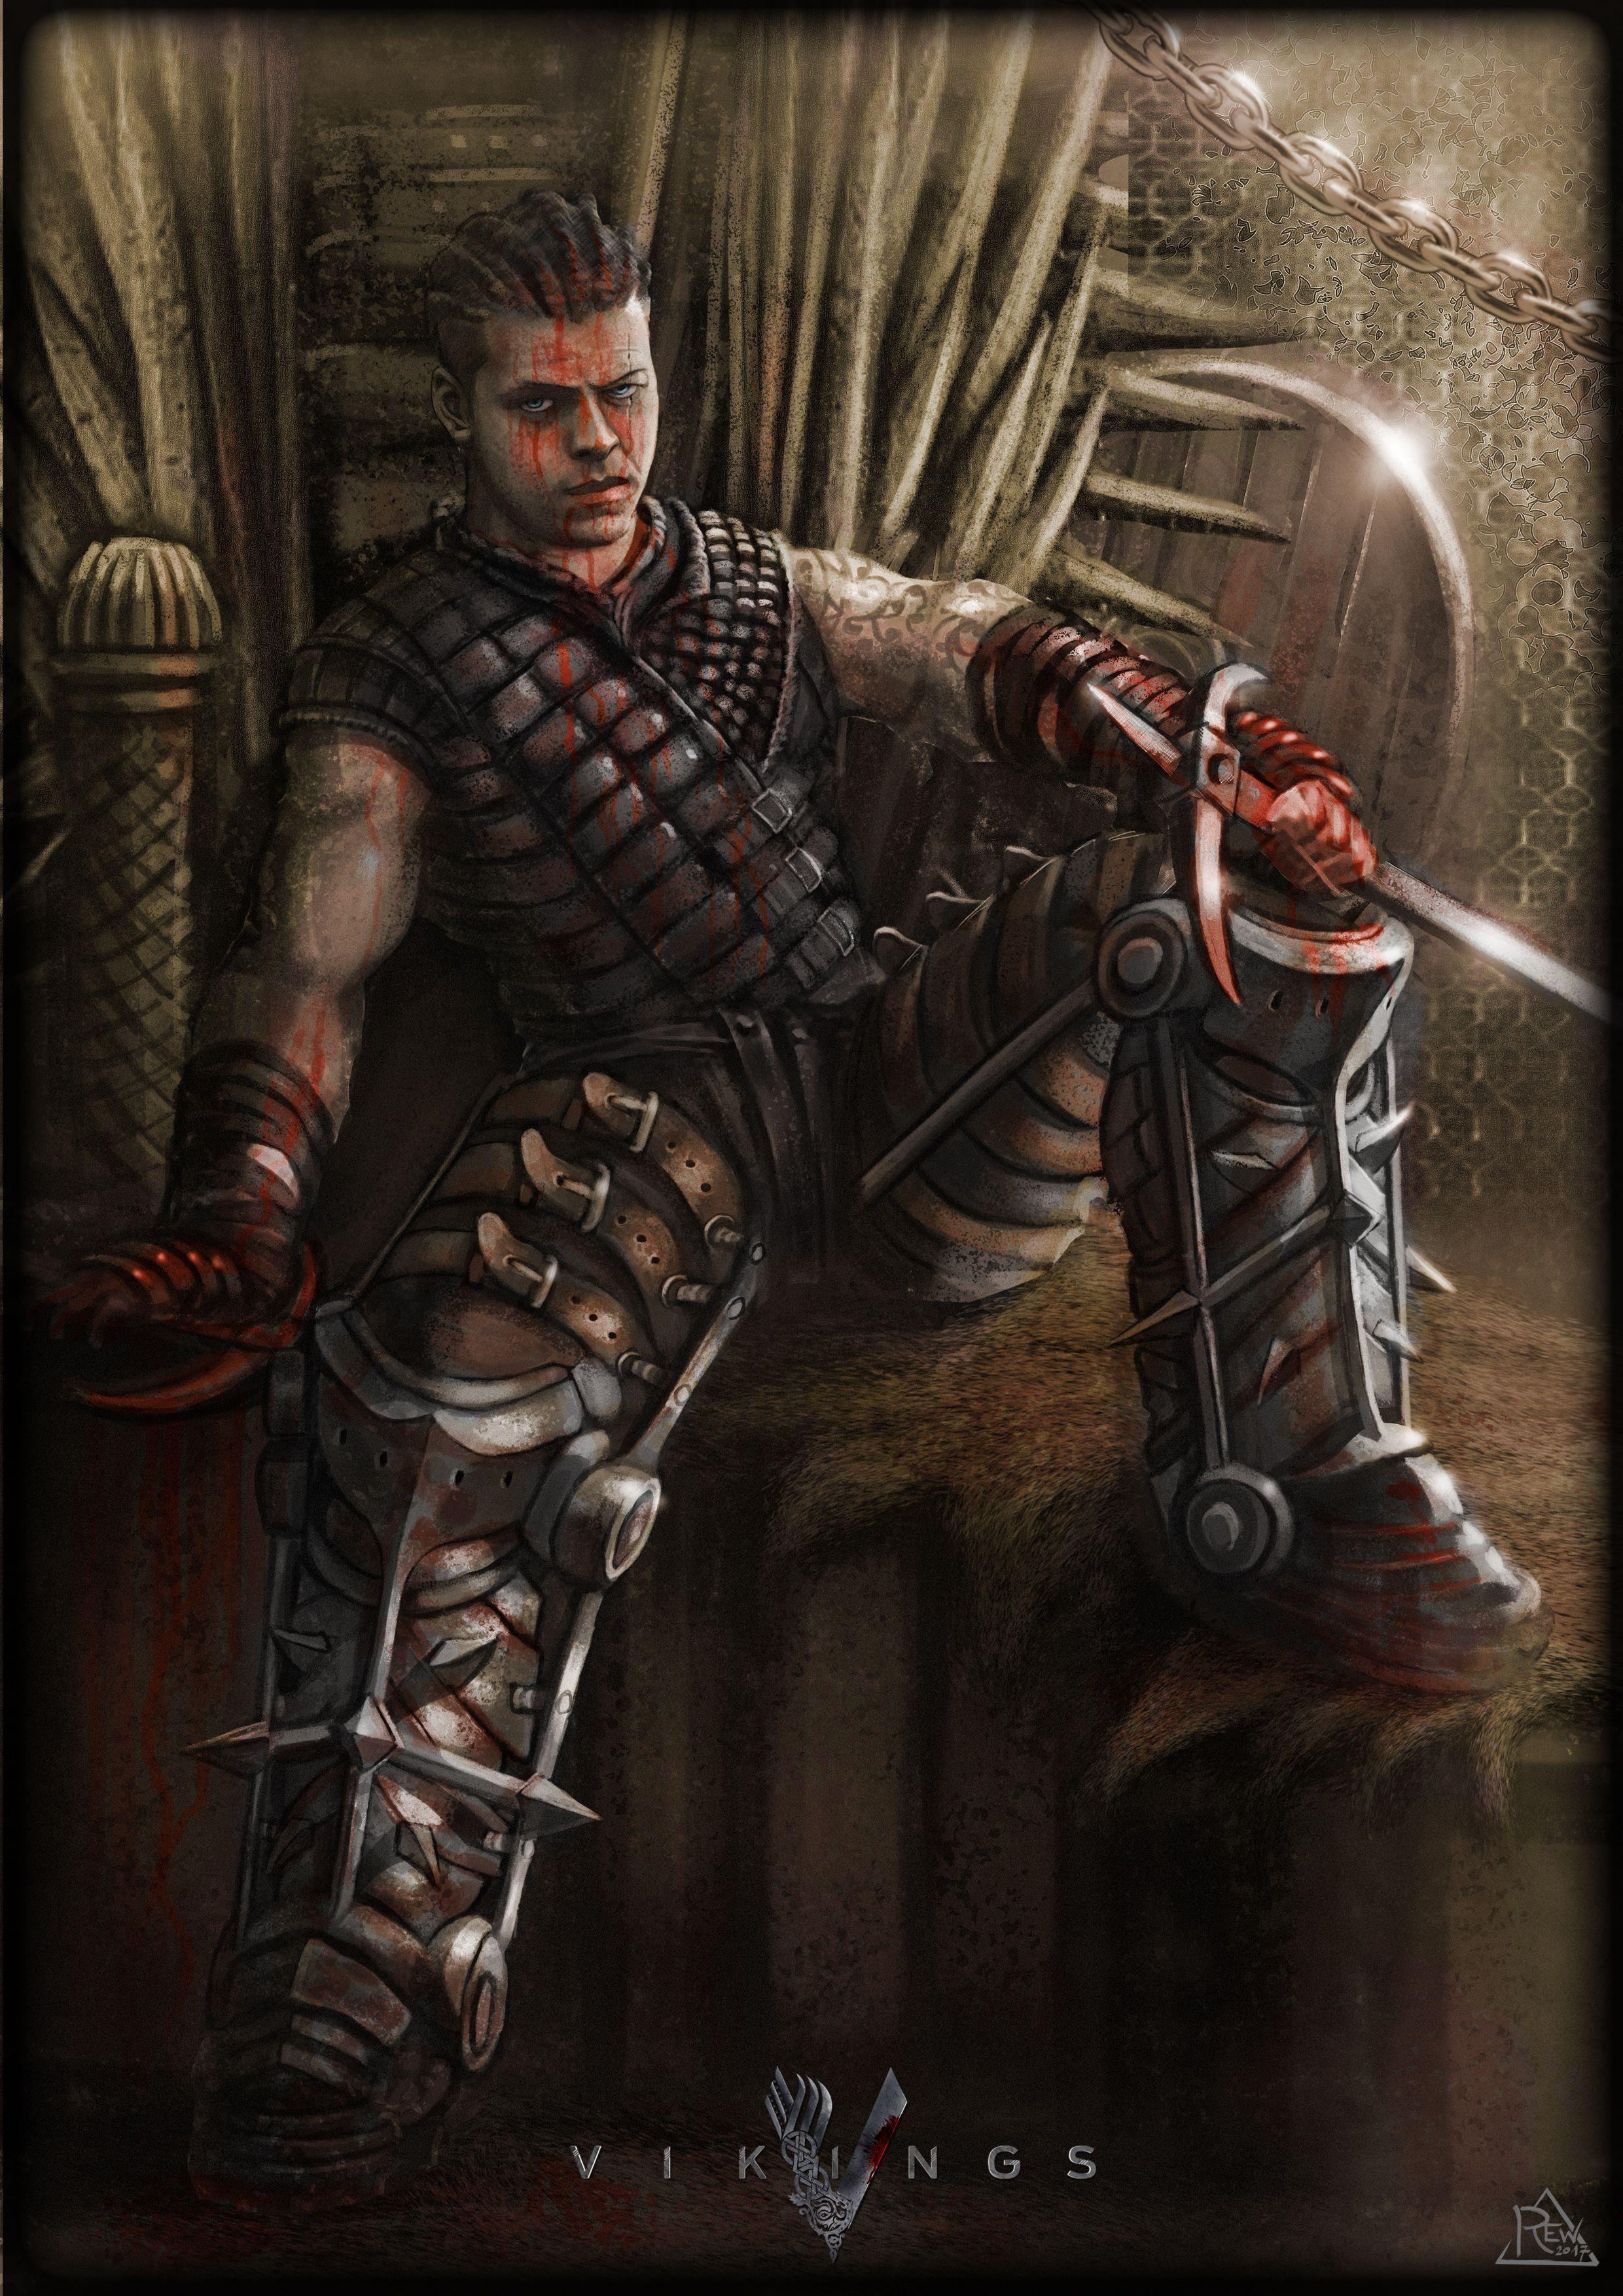 Ragnar Ragnar Lothbrok Wallpaper Iphone 412426 Hd